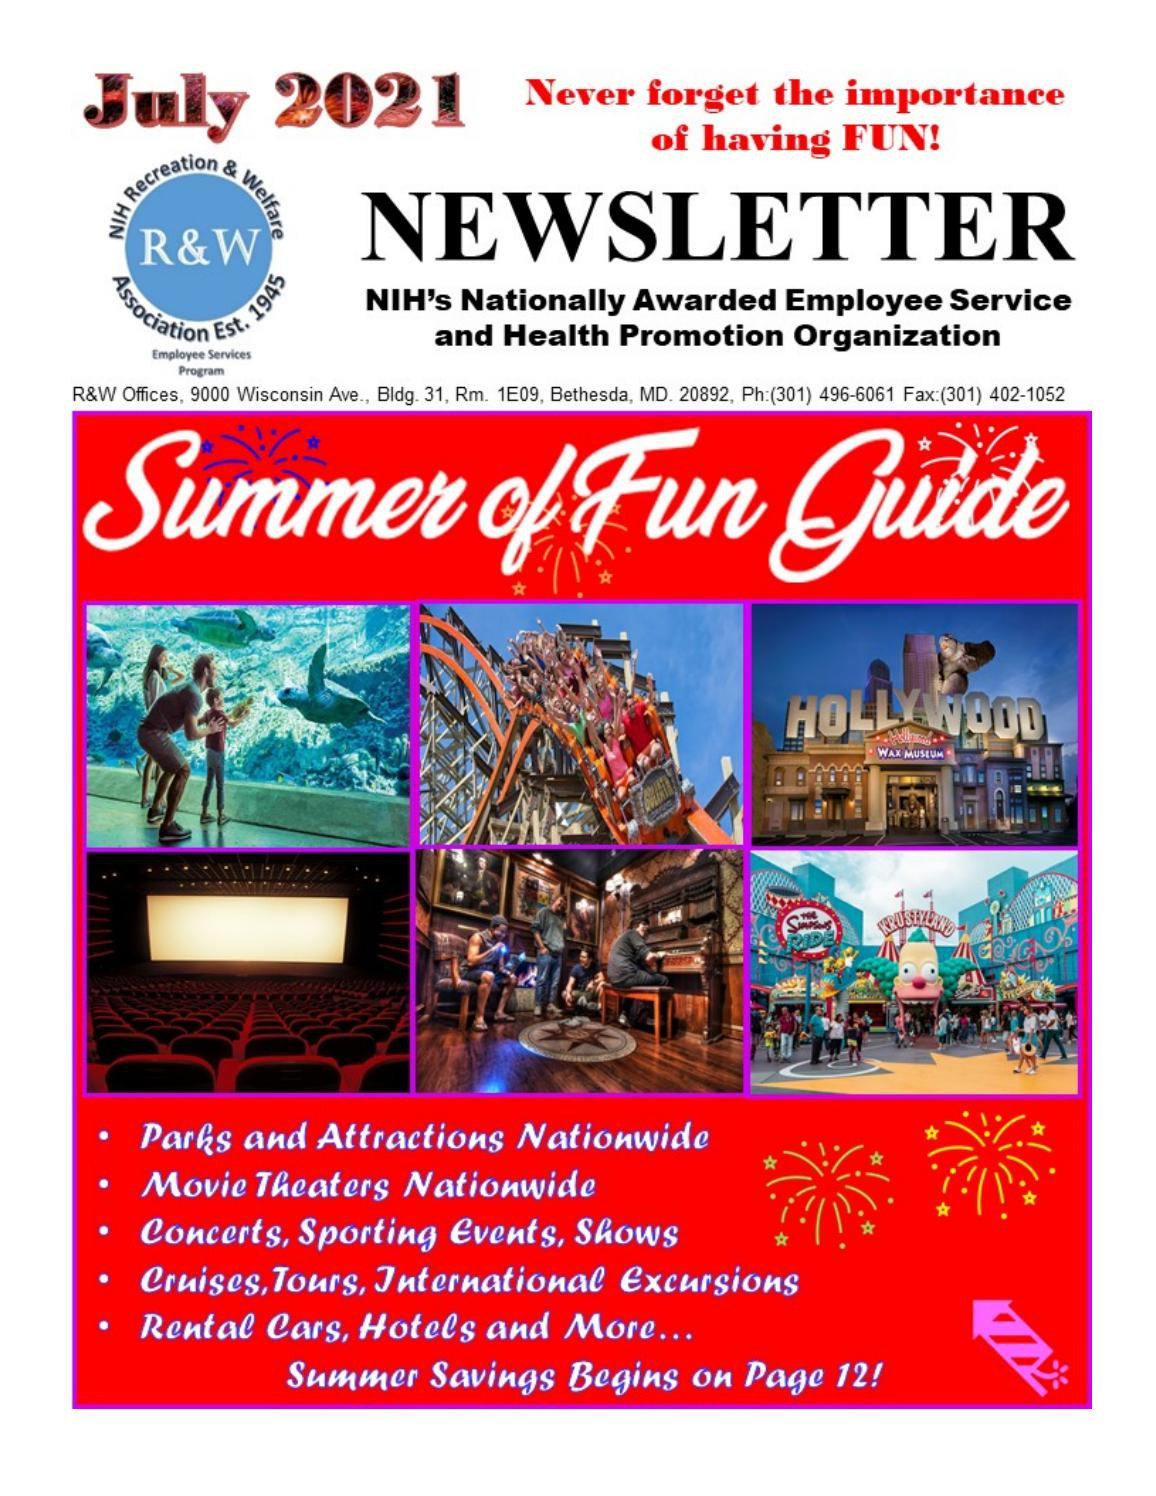 July 20 R&W Newsletter & Summer of Fun Guide by NIH R&W   issuu